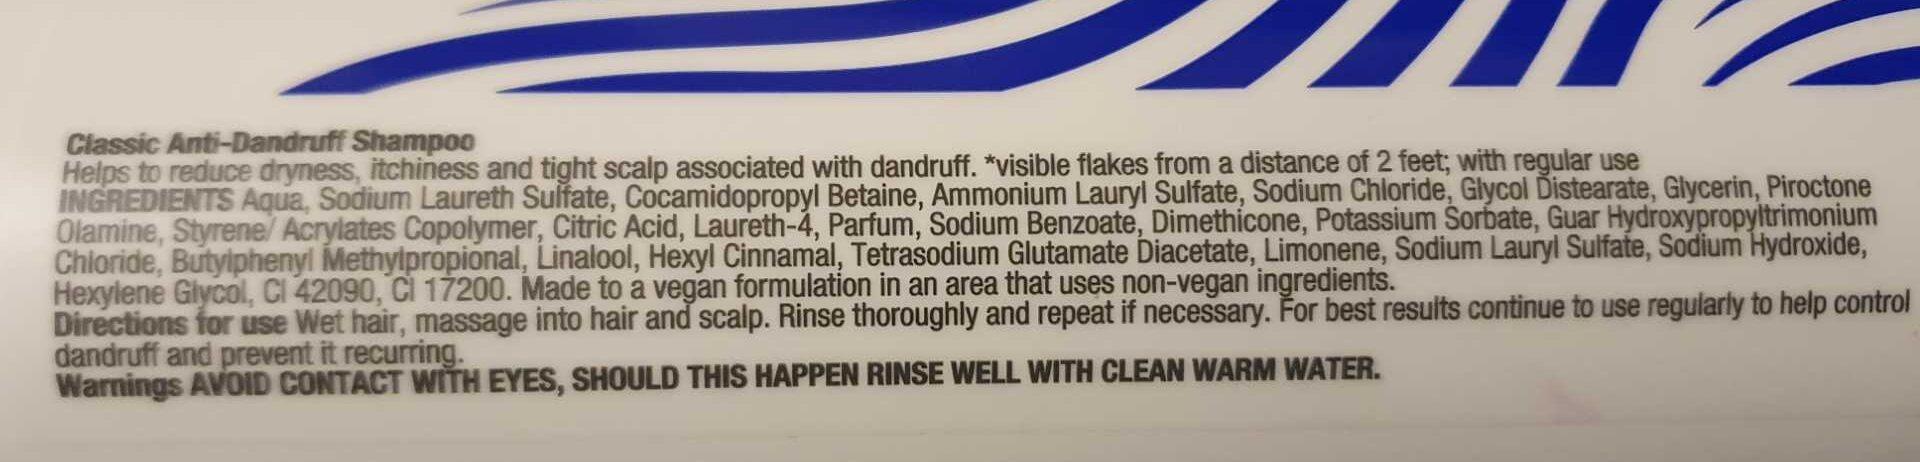 Classic anti dandruff shampoo - Ingredients - en